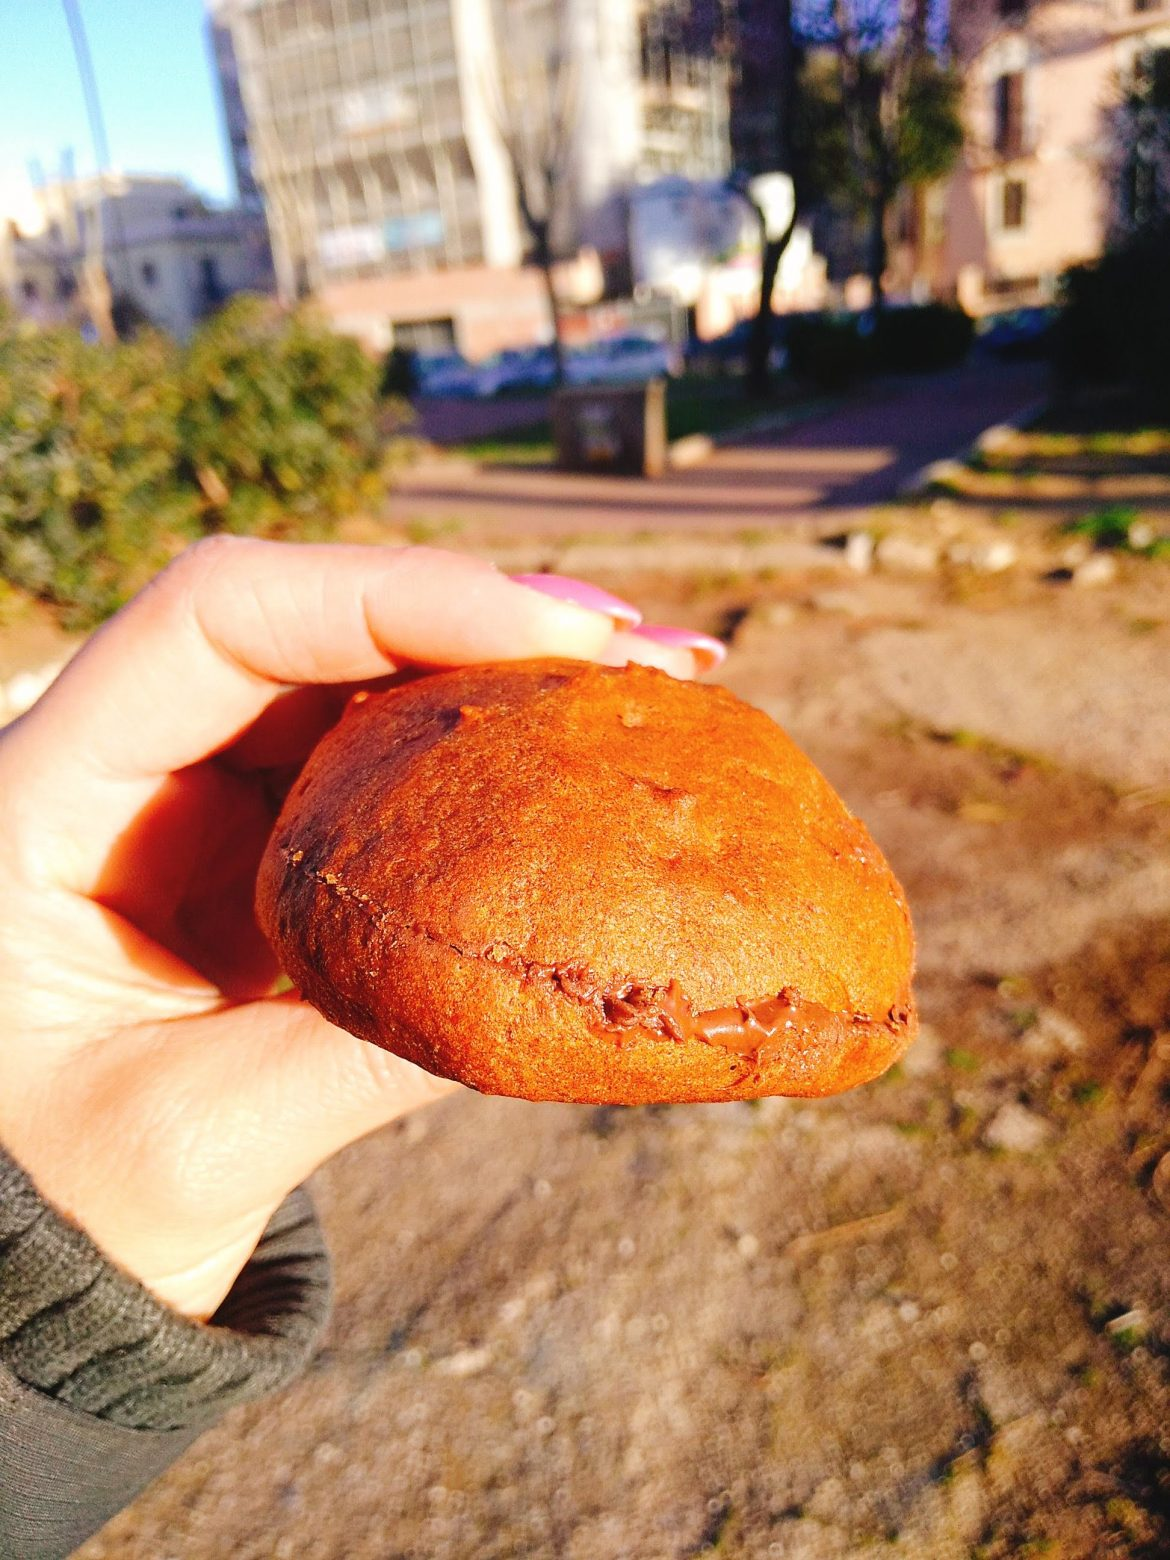 Pane chetogenico senza glutine: keto bread, pane cheto